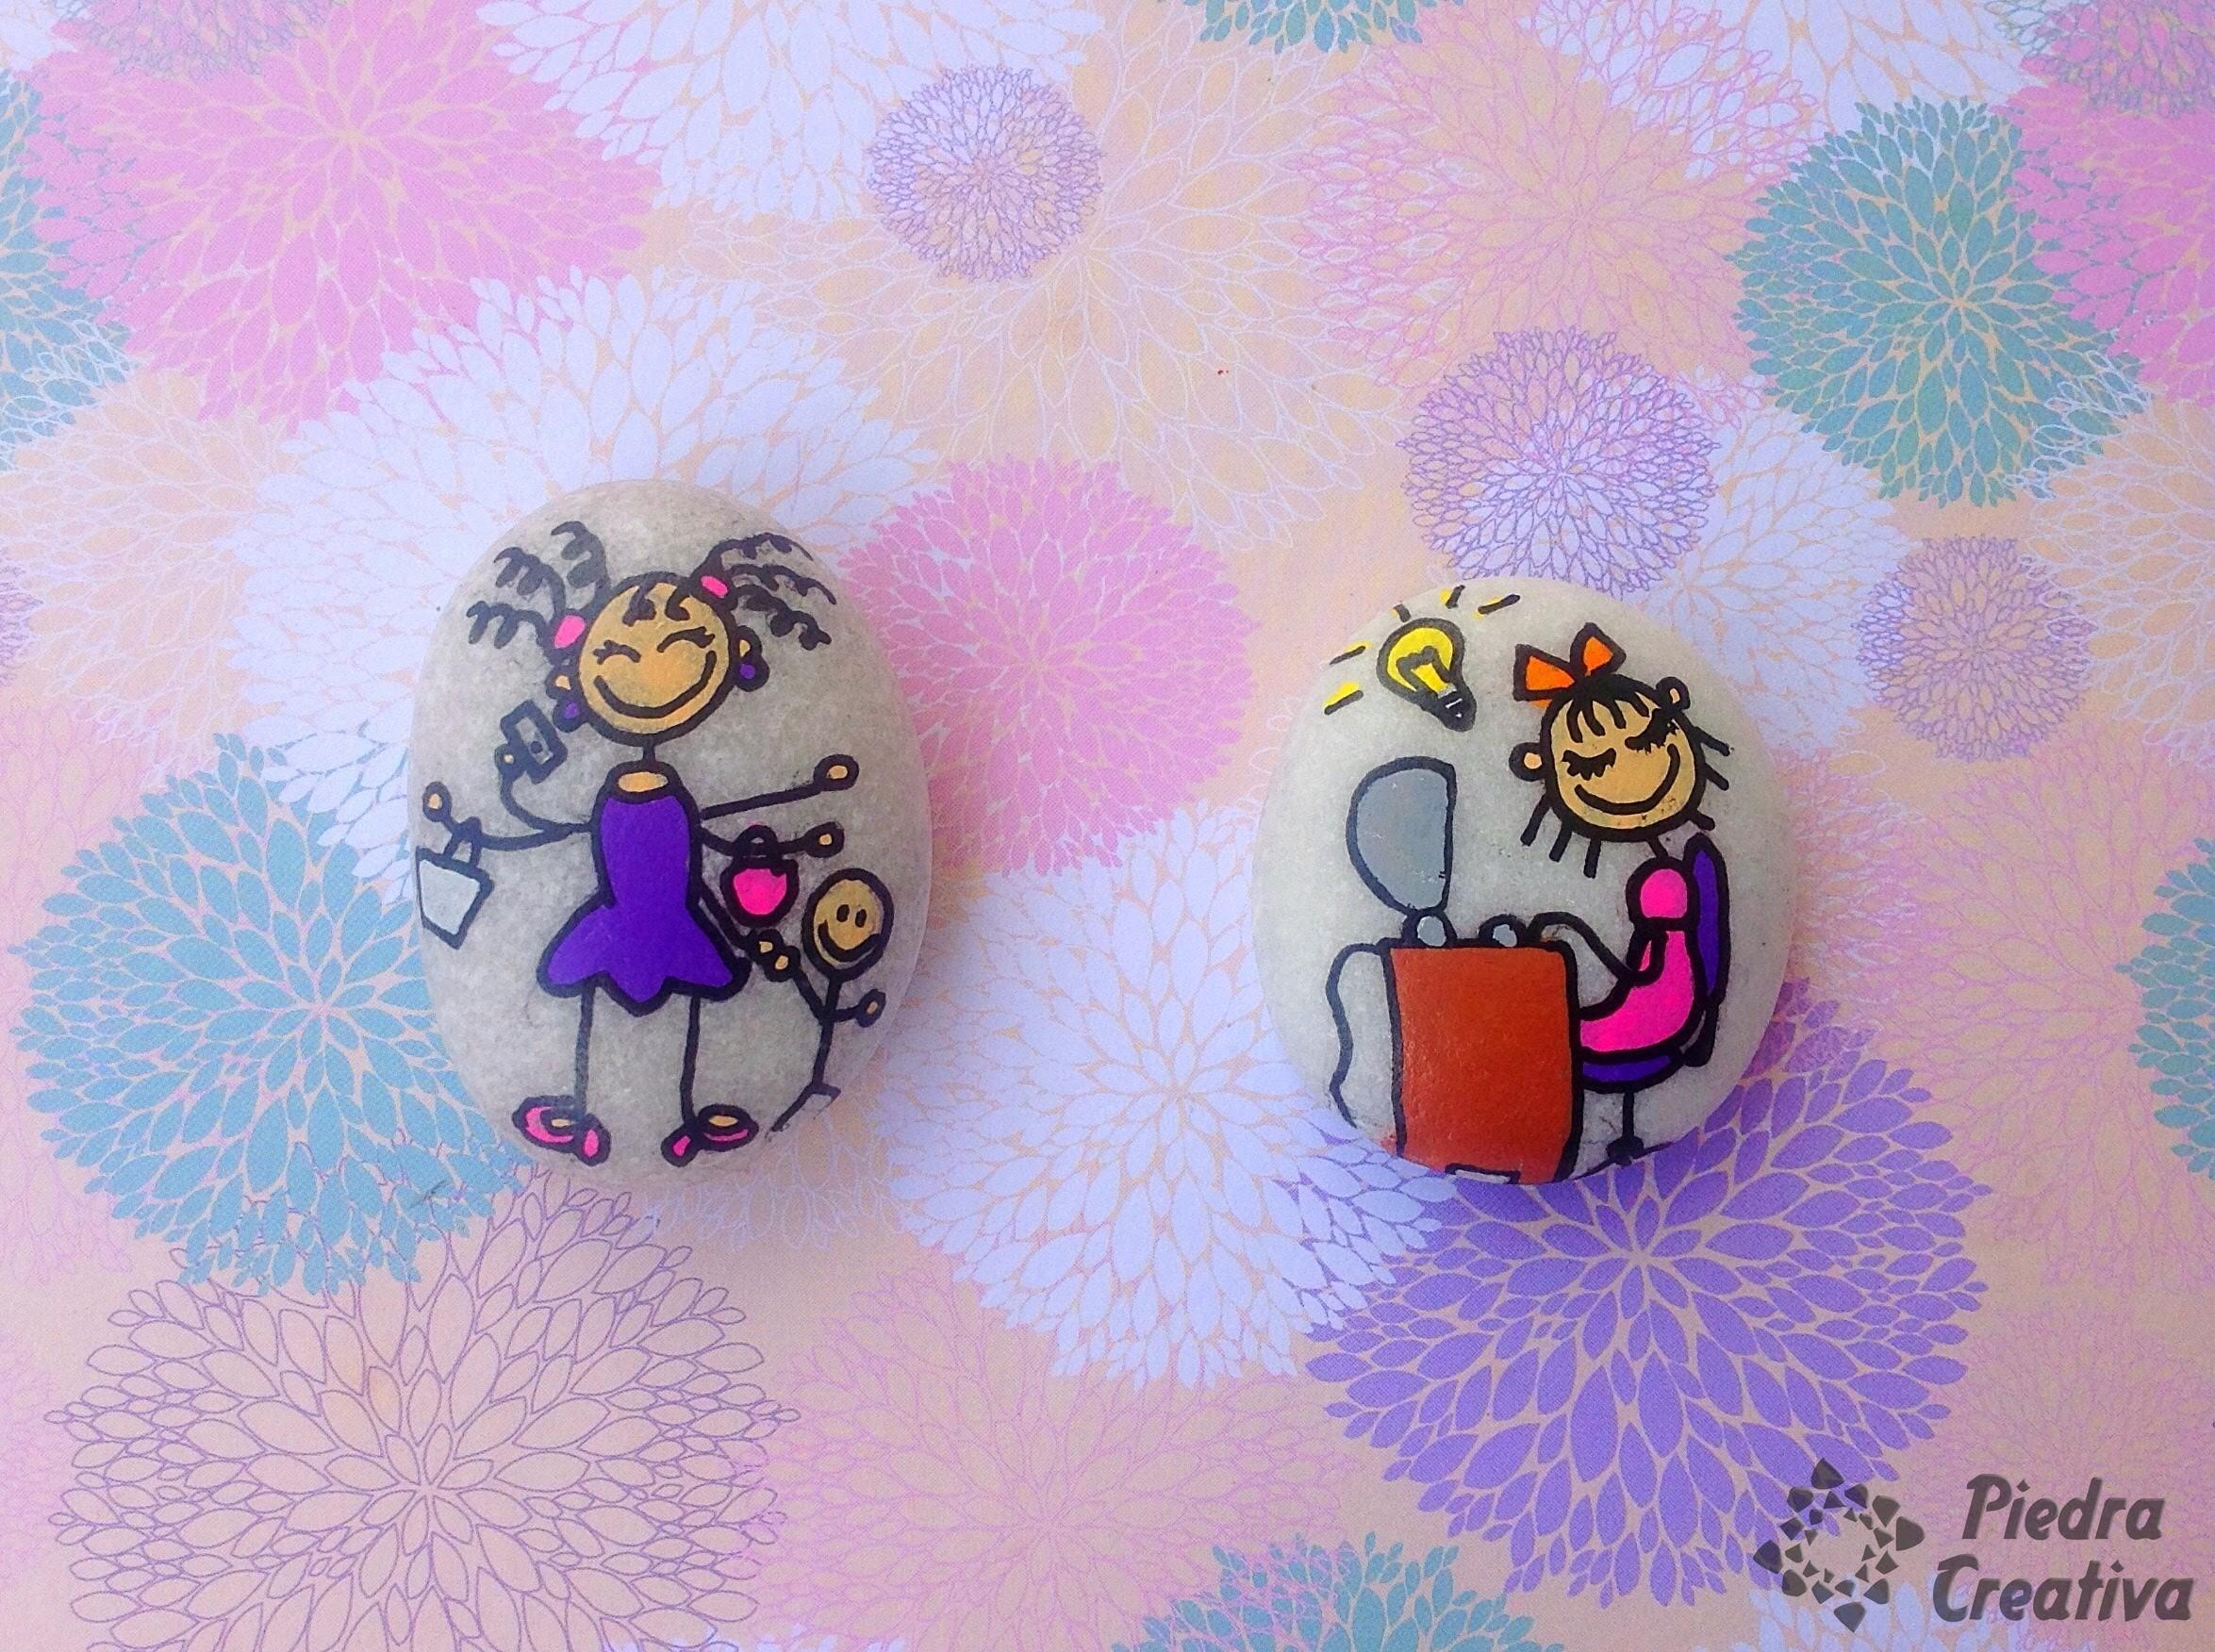 Mamá y bloguera en piedras pintadas